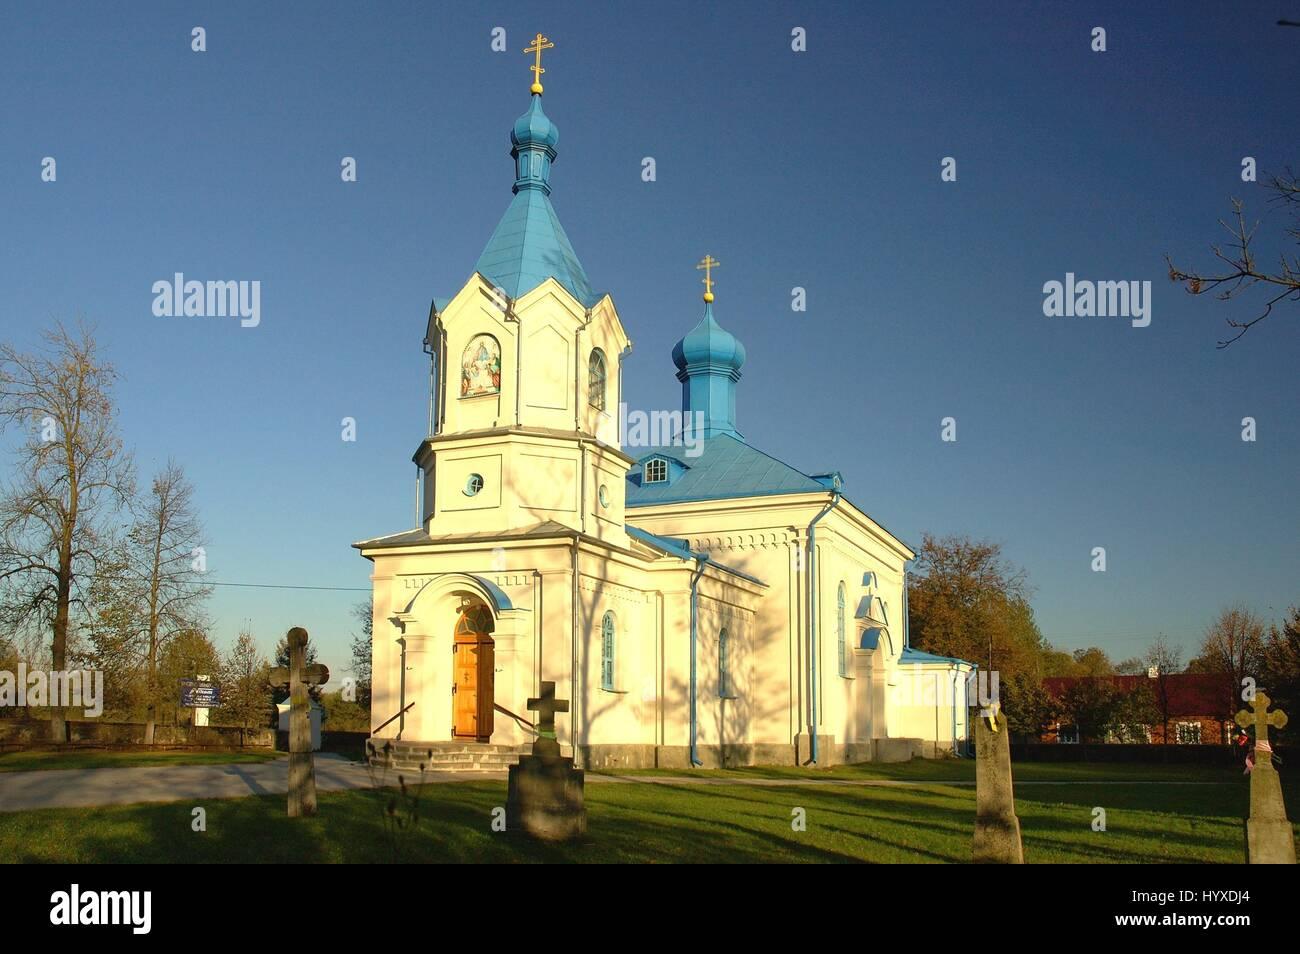 Poland, Hajnowka, Orthodox Church - Stock Image